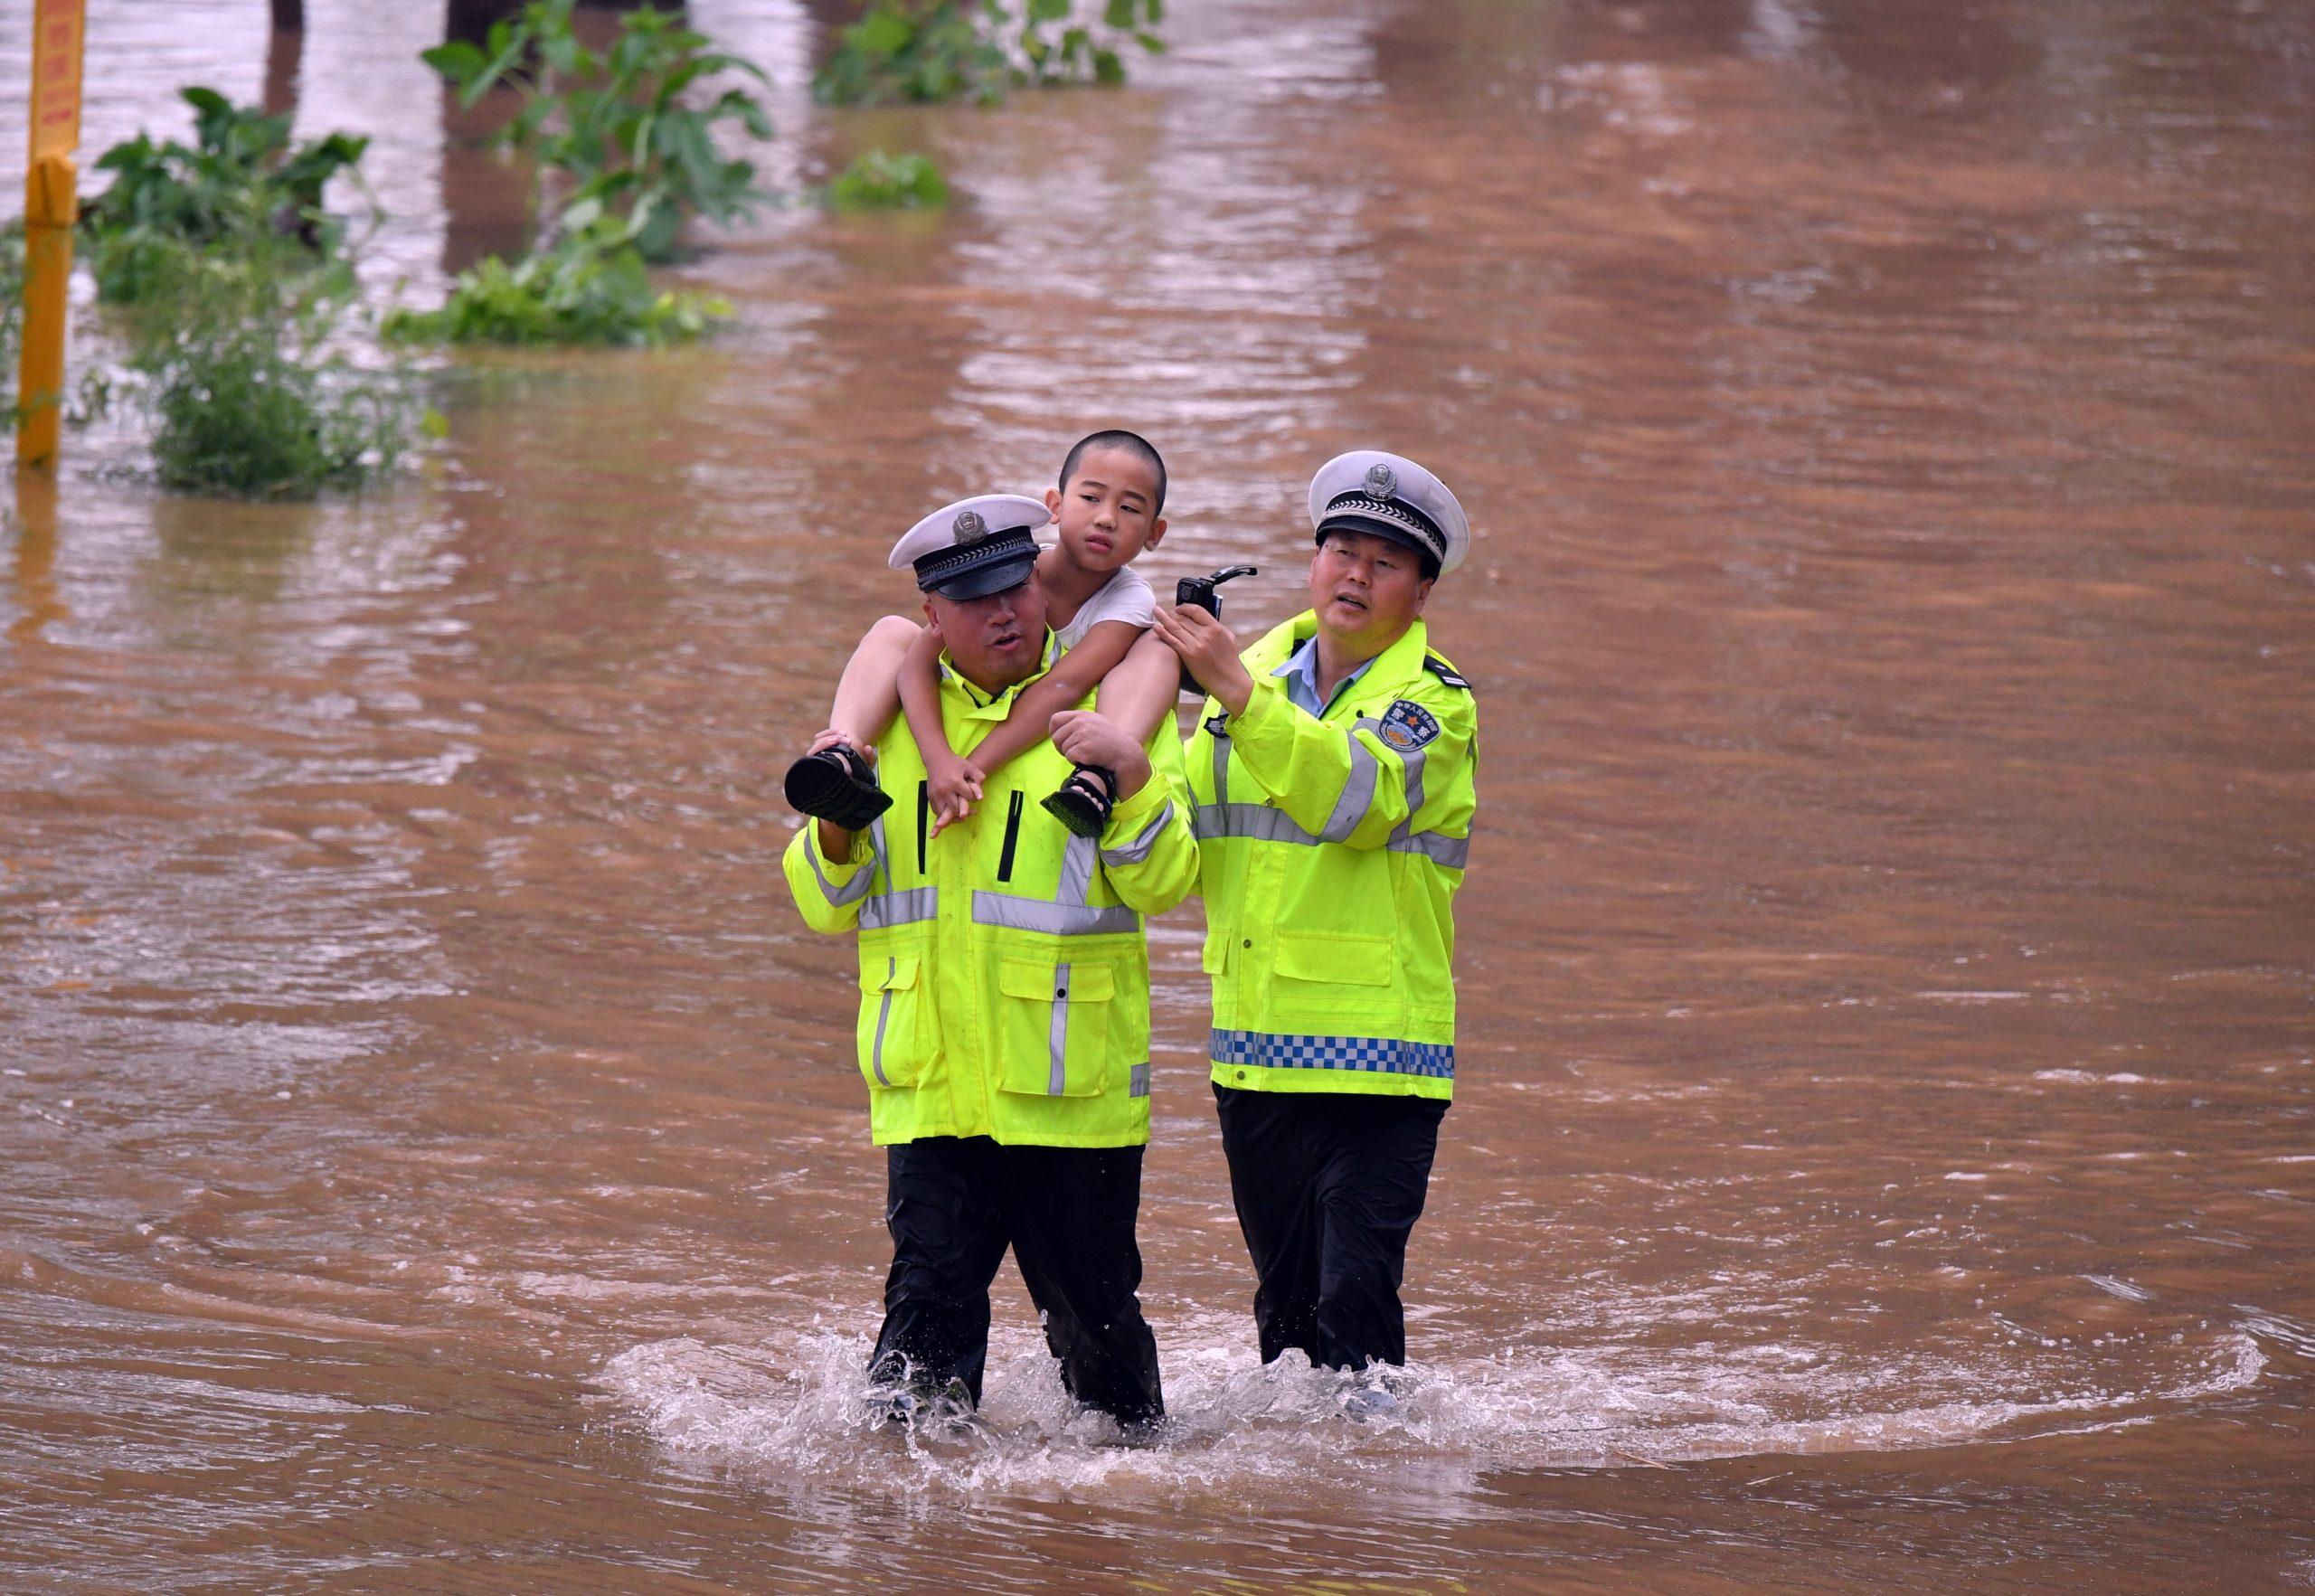 Sube a 56 cifra de muertos por fuertes lluvias en provincia china de Henan